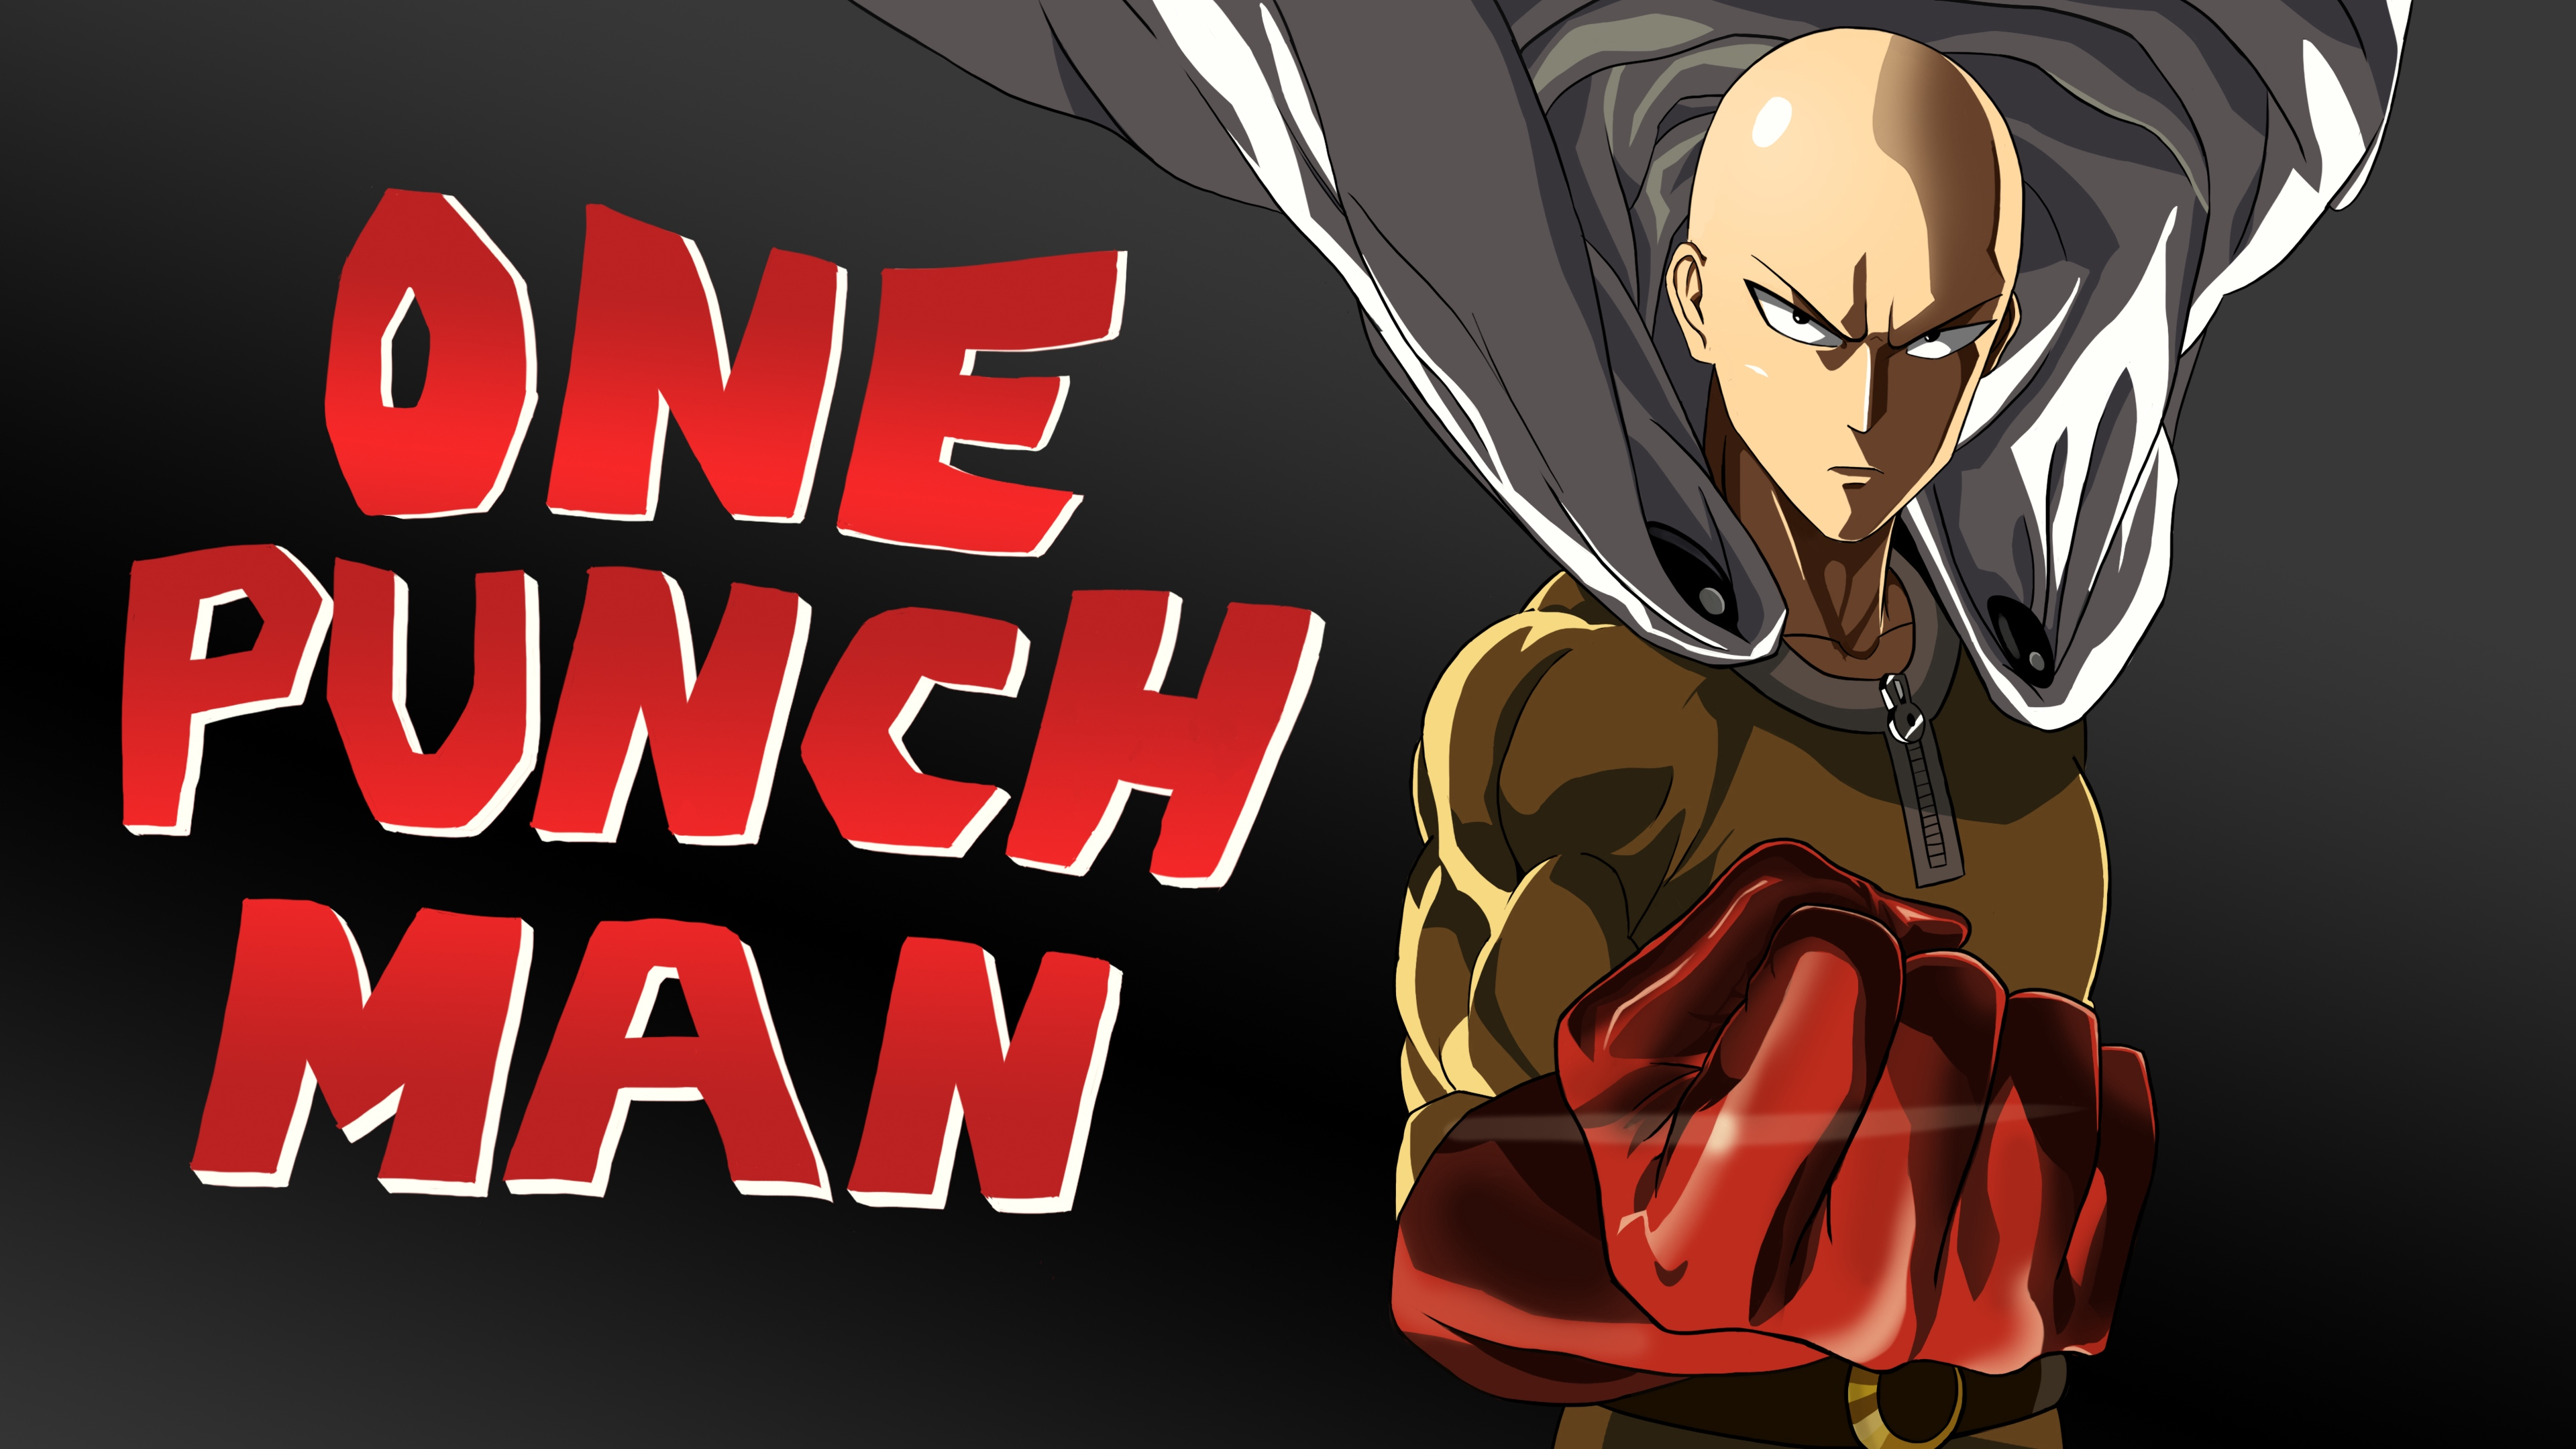 one punch man saitama art 4k 1541975746 - one punch man, saitama, art 4k - Saitama, one punch man, art